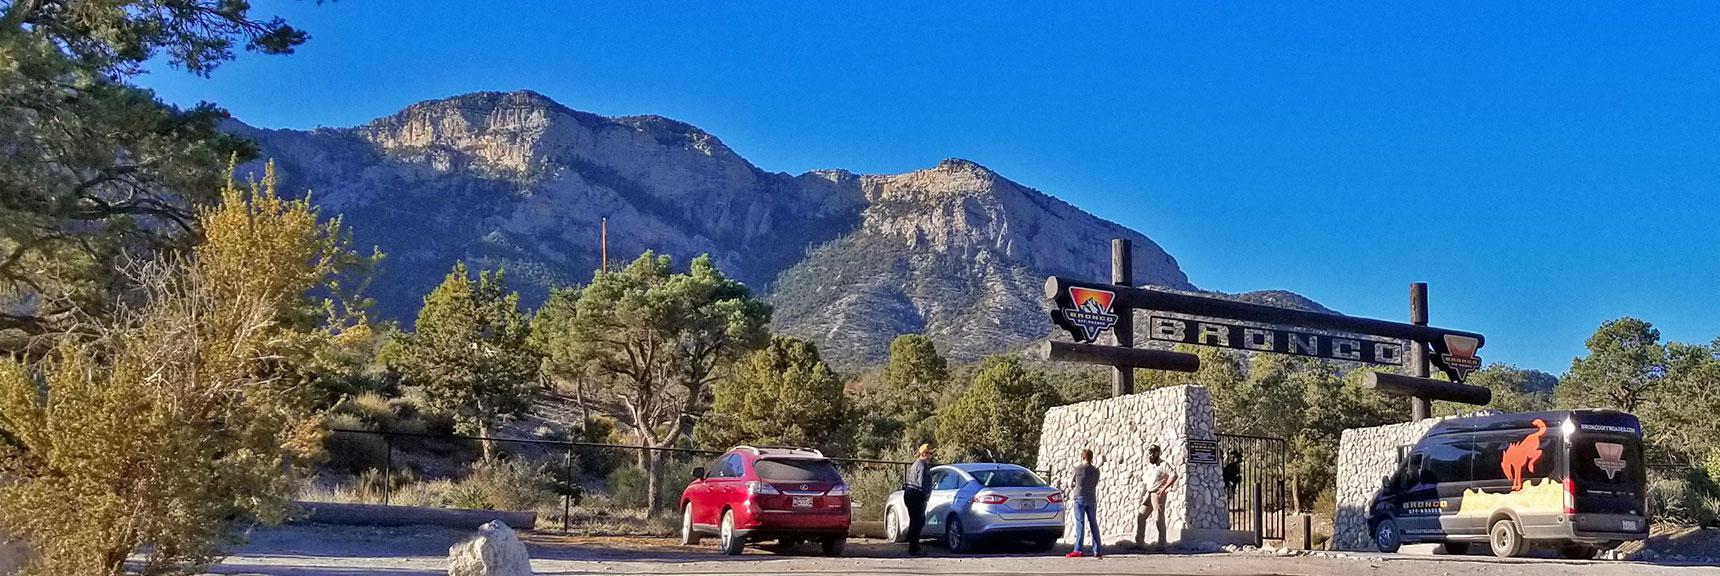 Bronco Off-Roadeo Off Roading Adventures   Potosi Mountain Northwestern Approach, Spring Mountains, Nevada